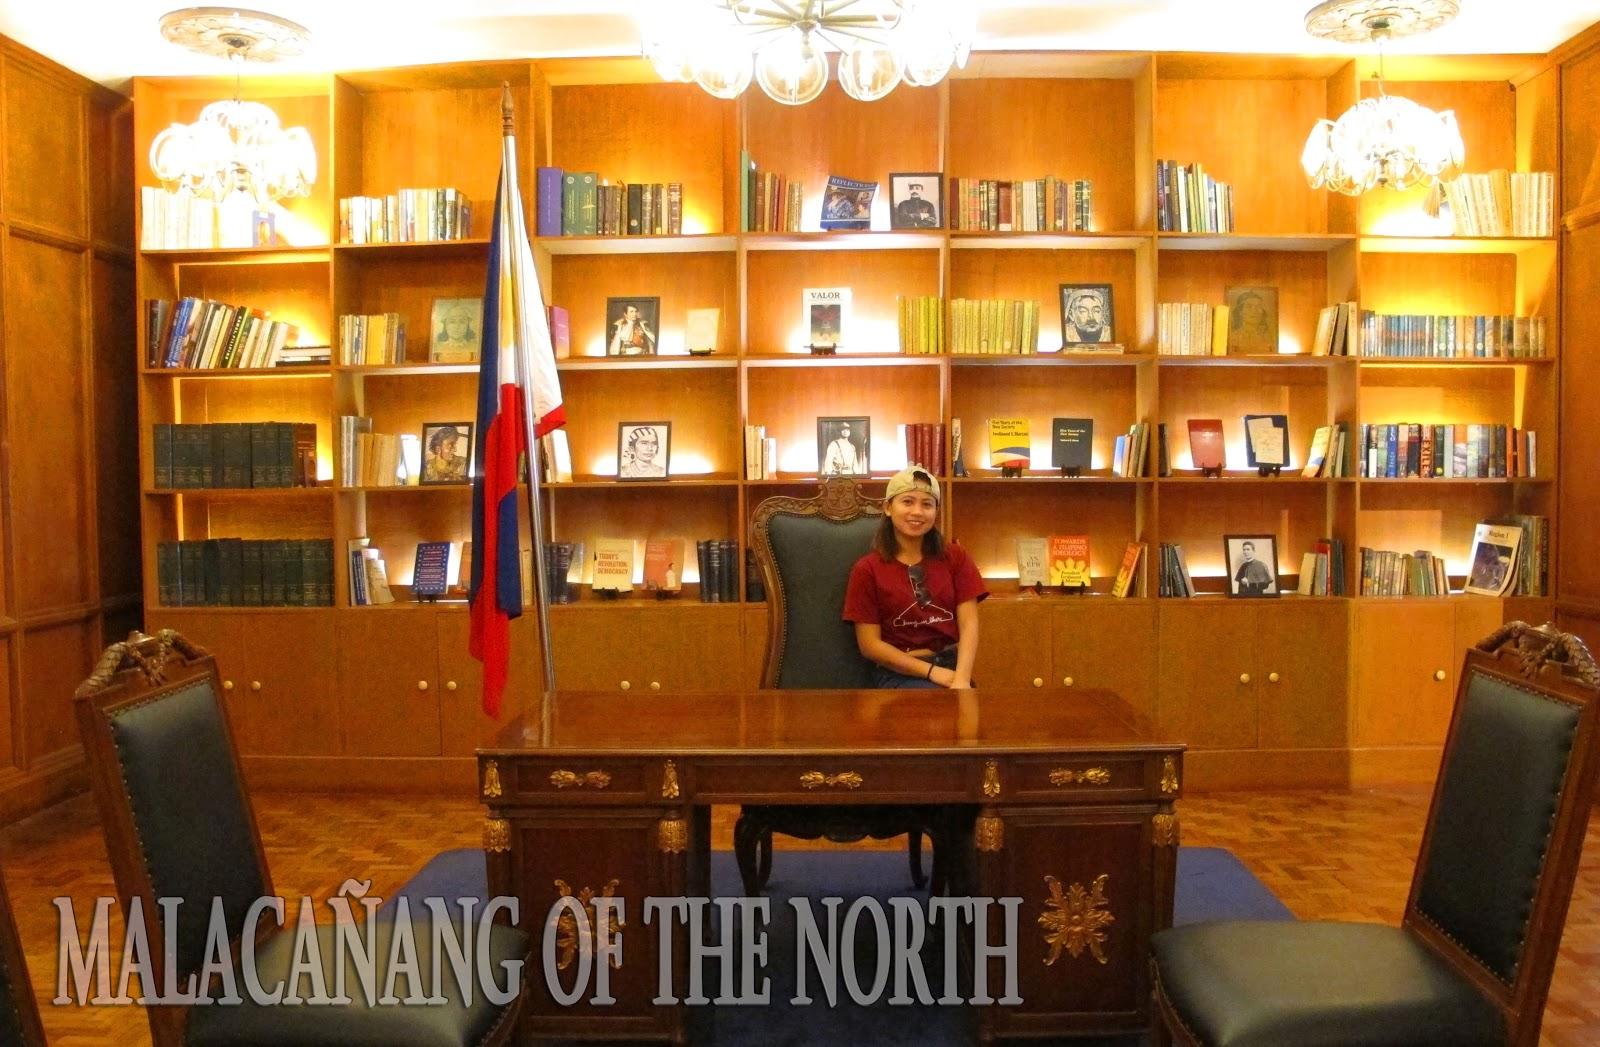 Malacañang of the North